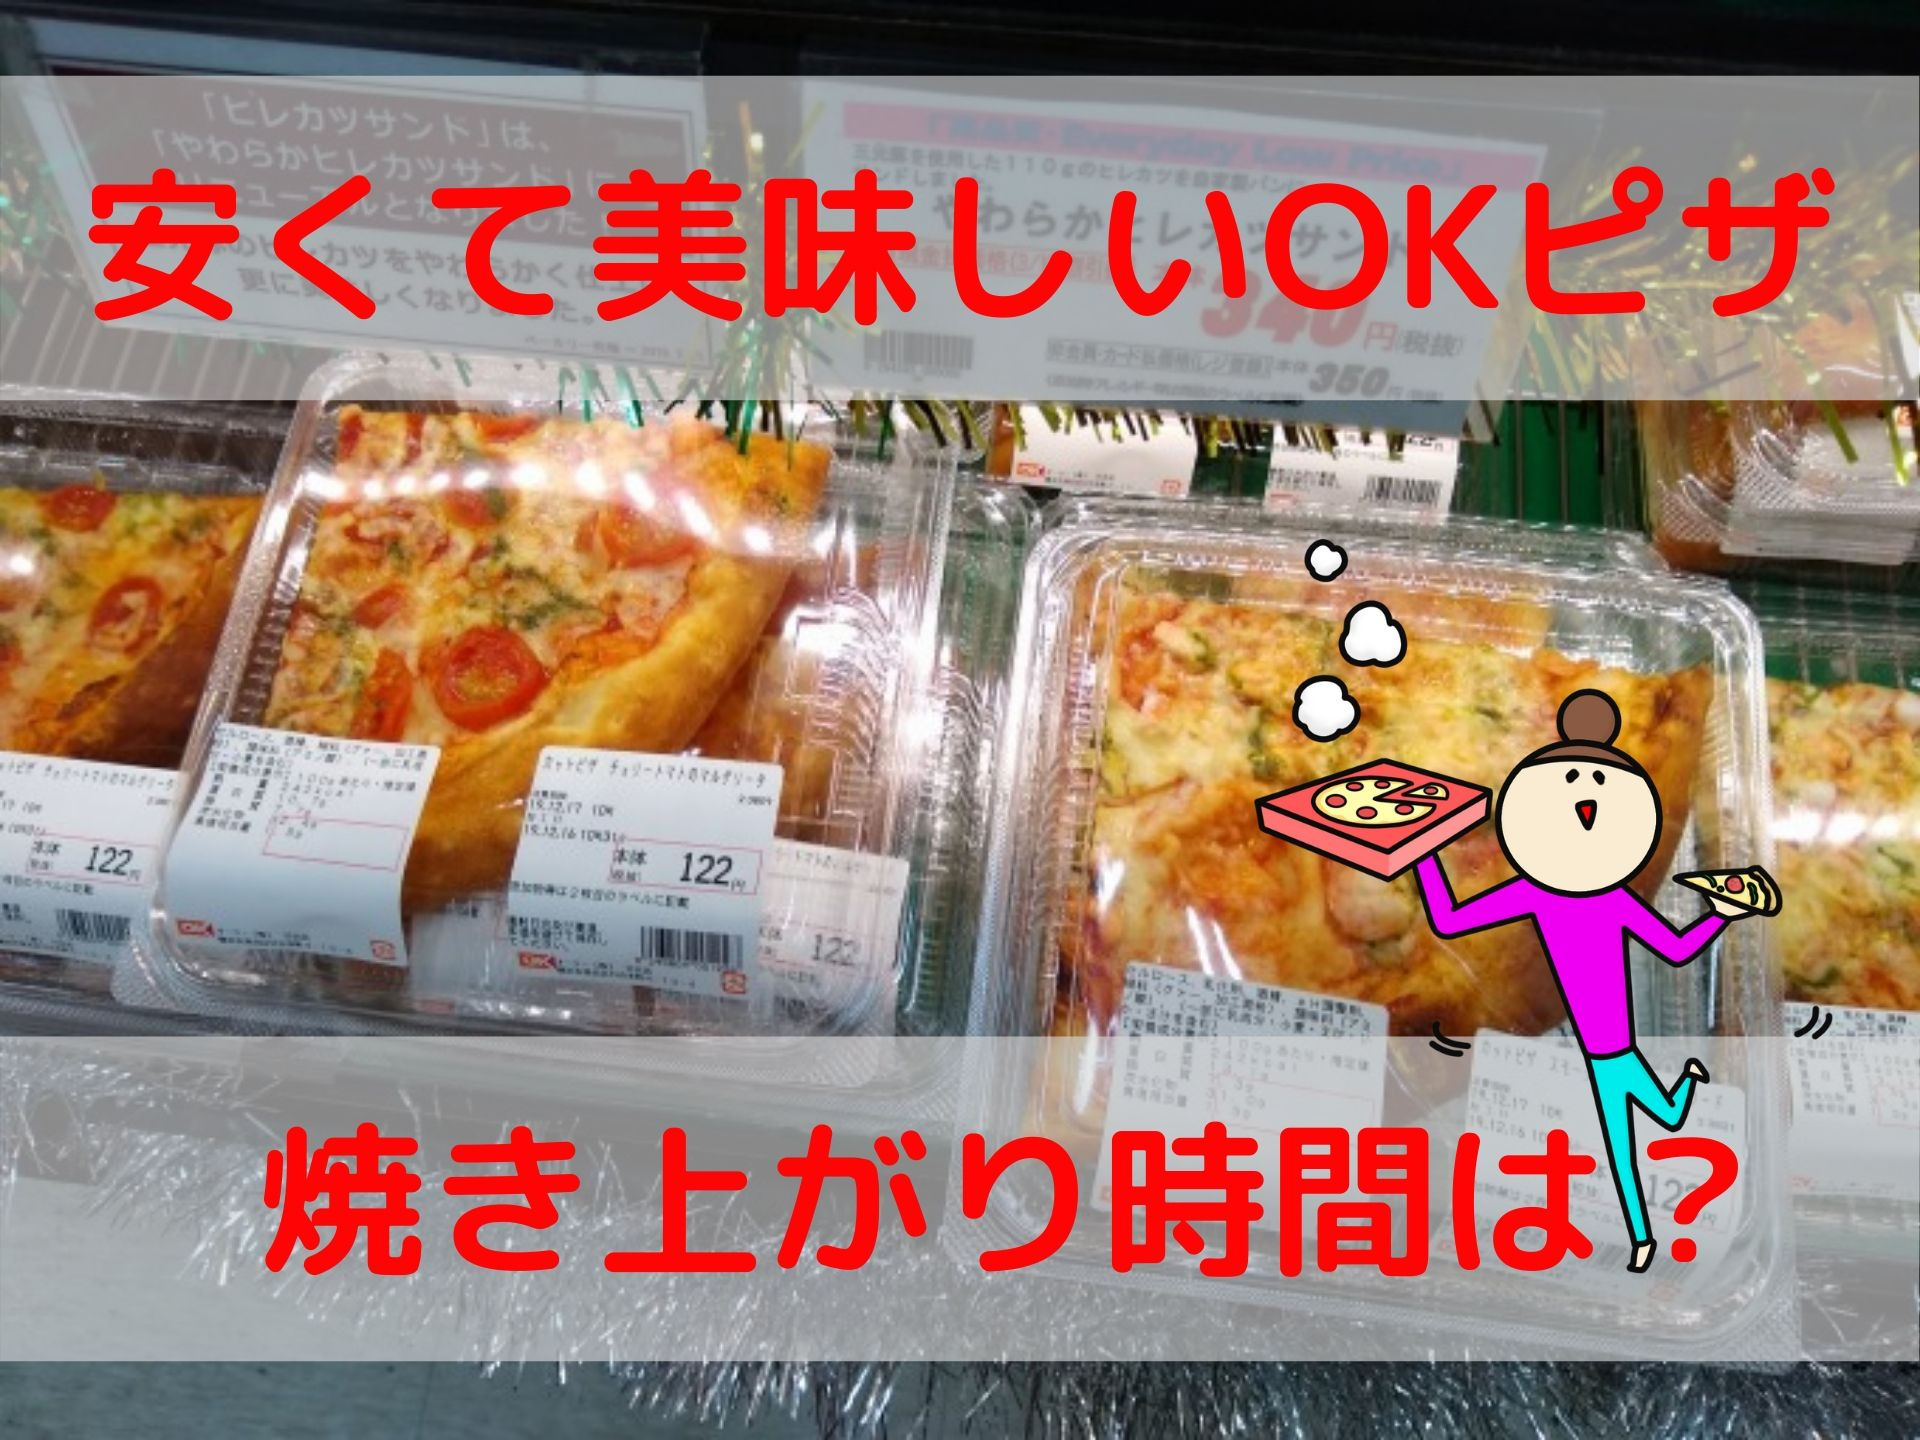 OKストア日吉のピザ焼き上がり時間